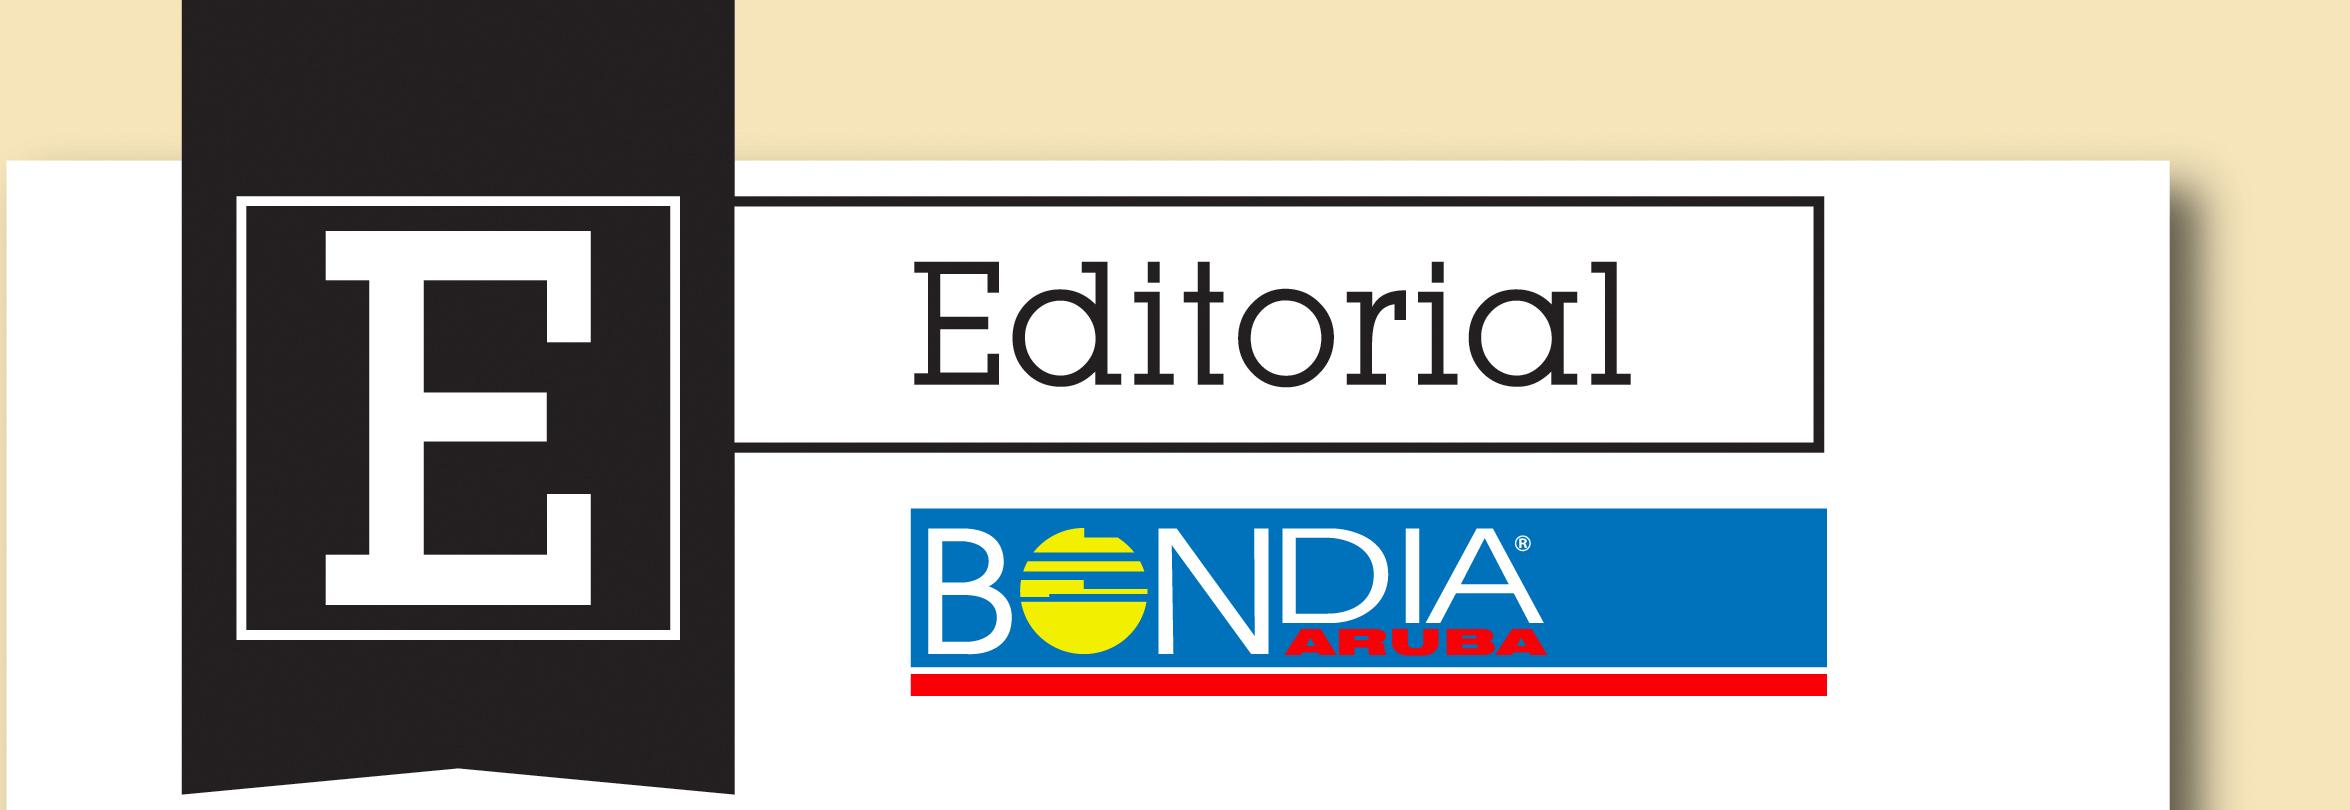 Home - Bon Dia Aruba | Noticia di Aruba